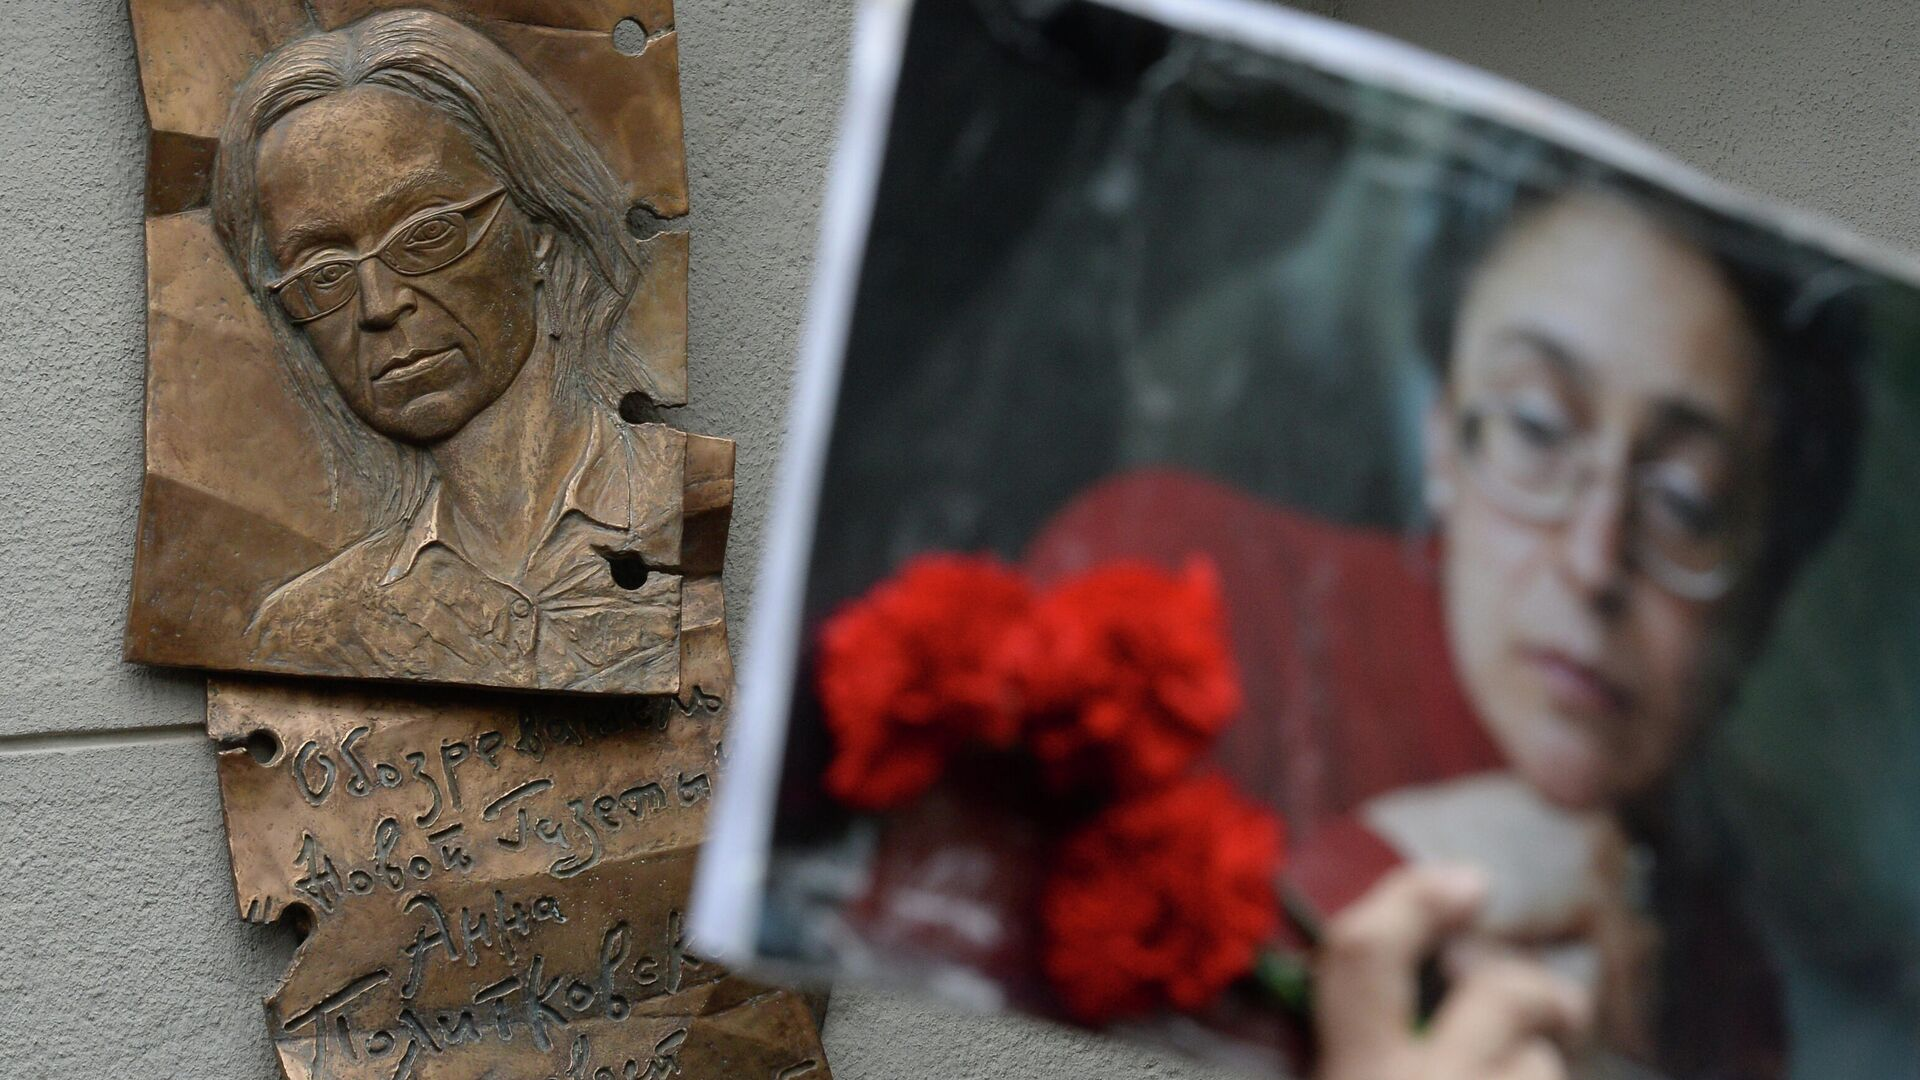 Una placa conmemorativa en honor de la periodista Anna Politkóvskaya  - Sputnik Mundo, 1920, 07.10.2021